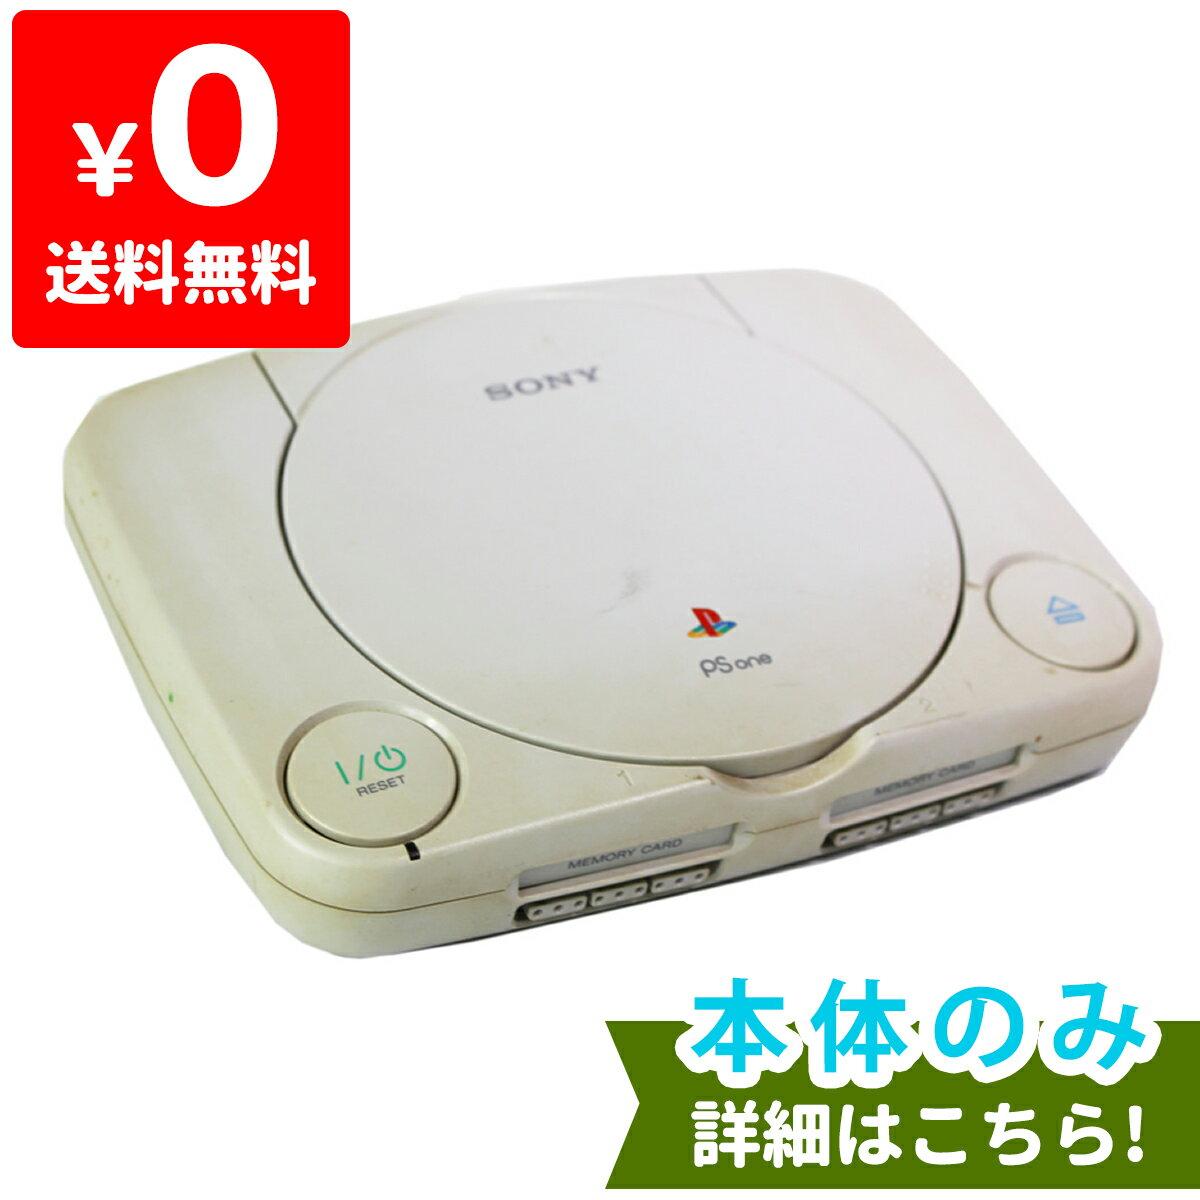 PS プレイステーション PlayStation 本体 中古 PSone プレステ SONY ソニー 4948872001007 送料無料